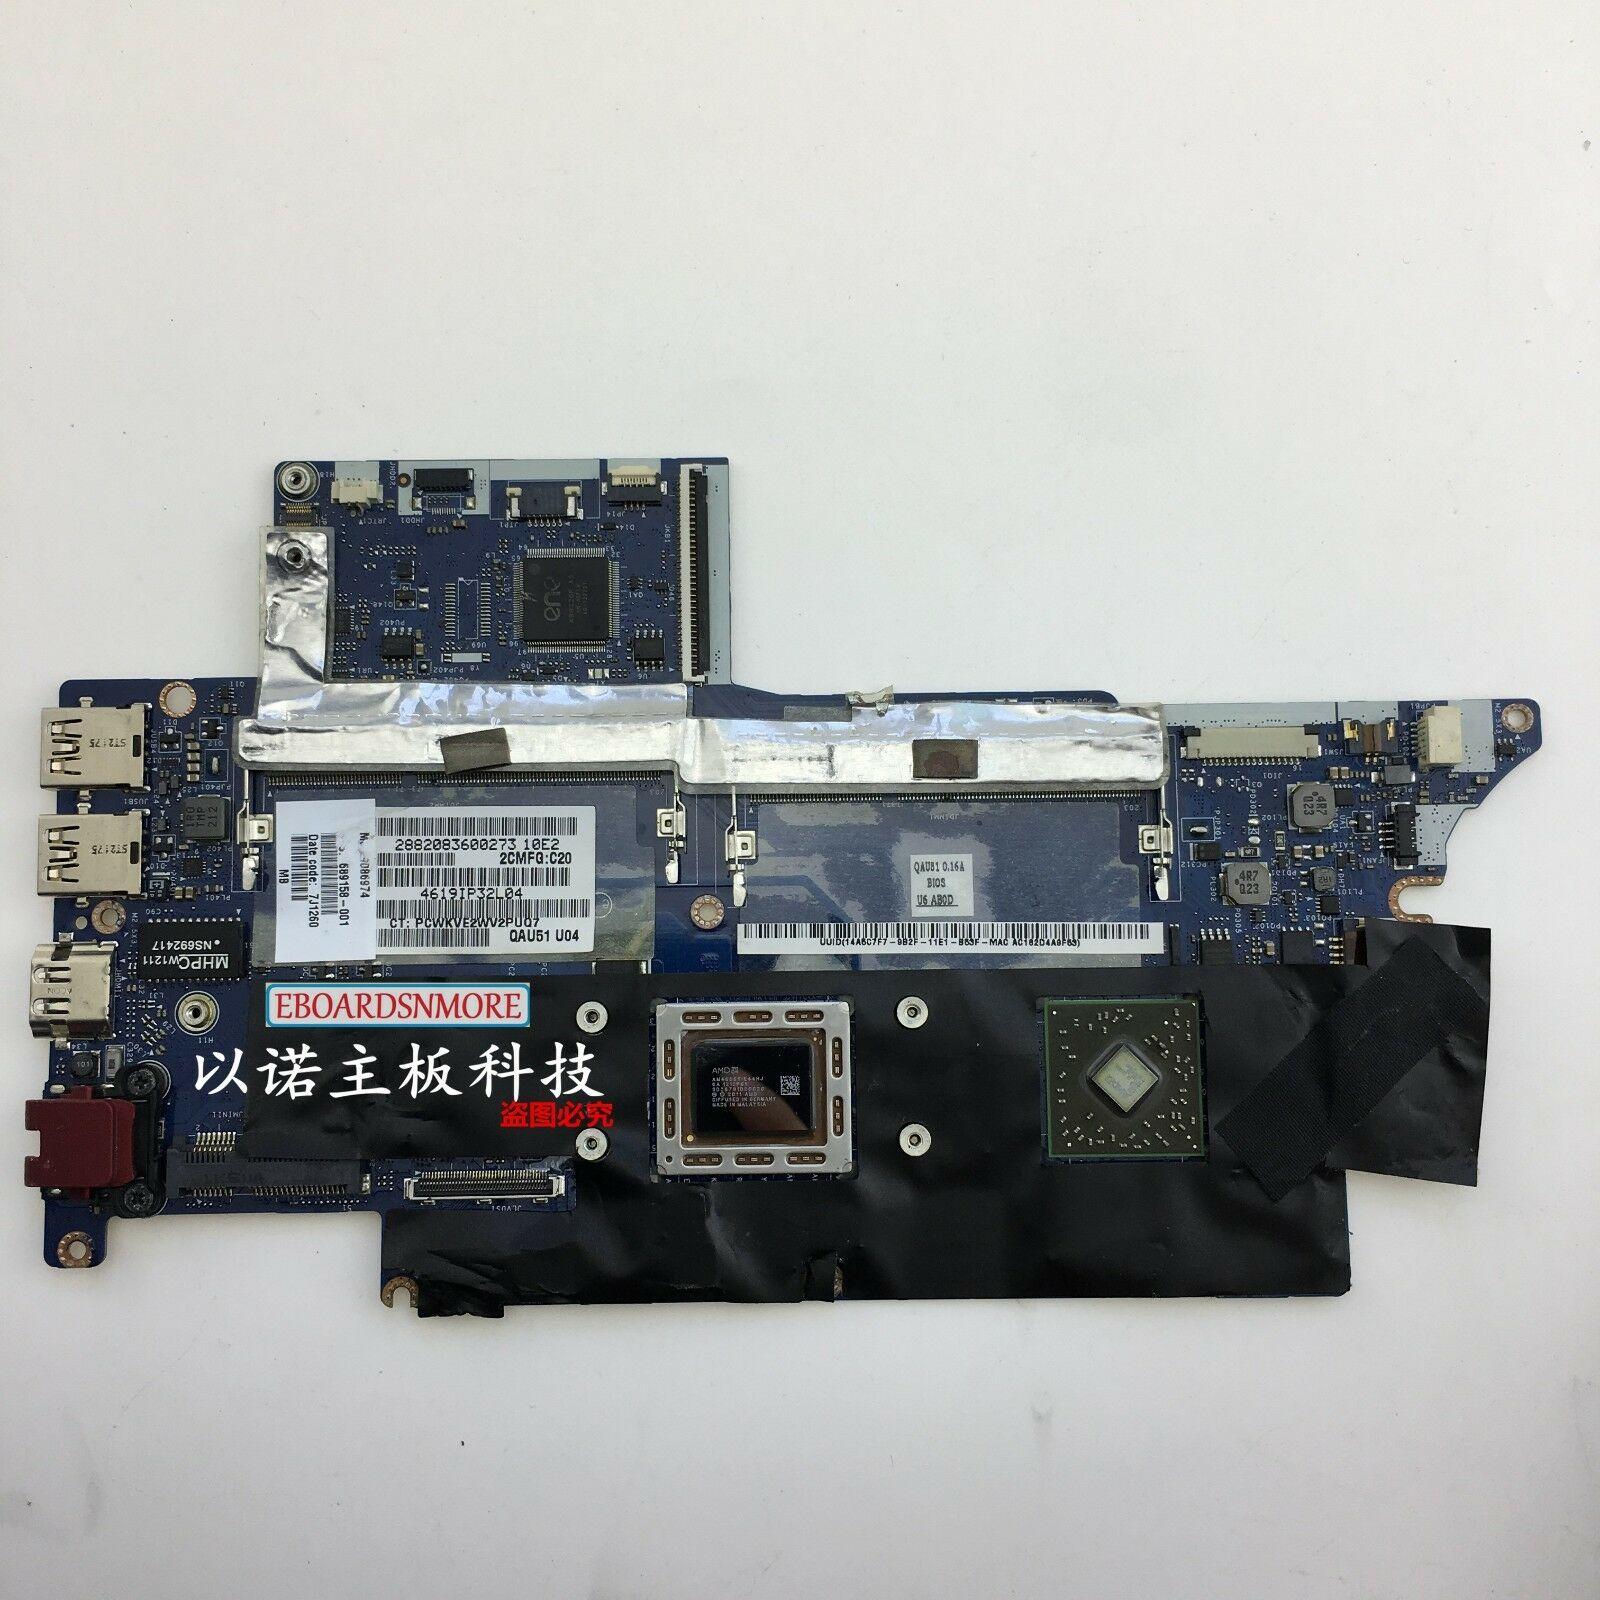 605319-001 for HP DV7 DV7-4000 Intel laptop motherboard,ATI HD6370,DA0LX6MB6H1